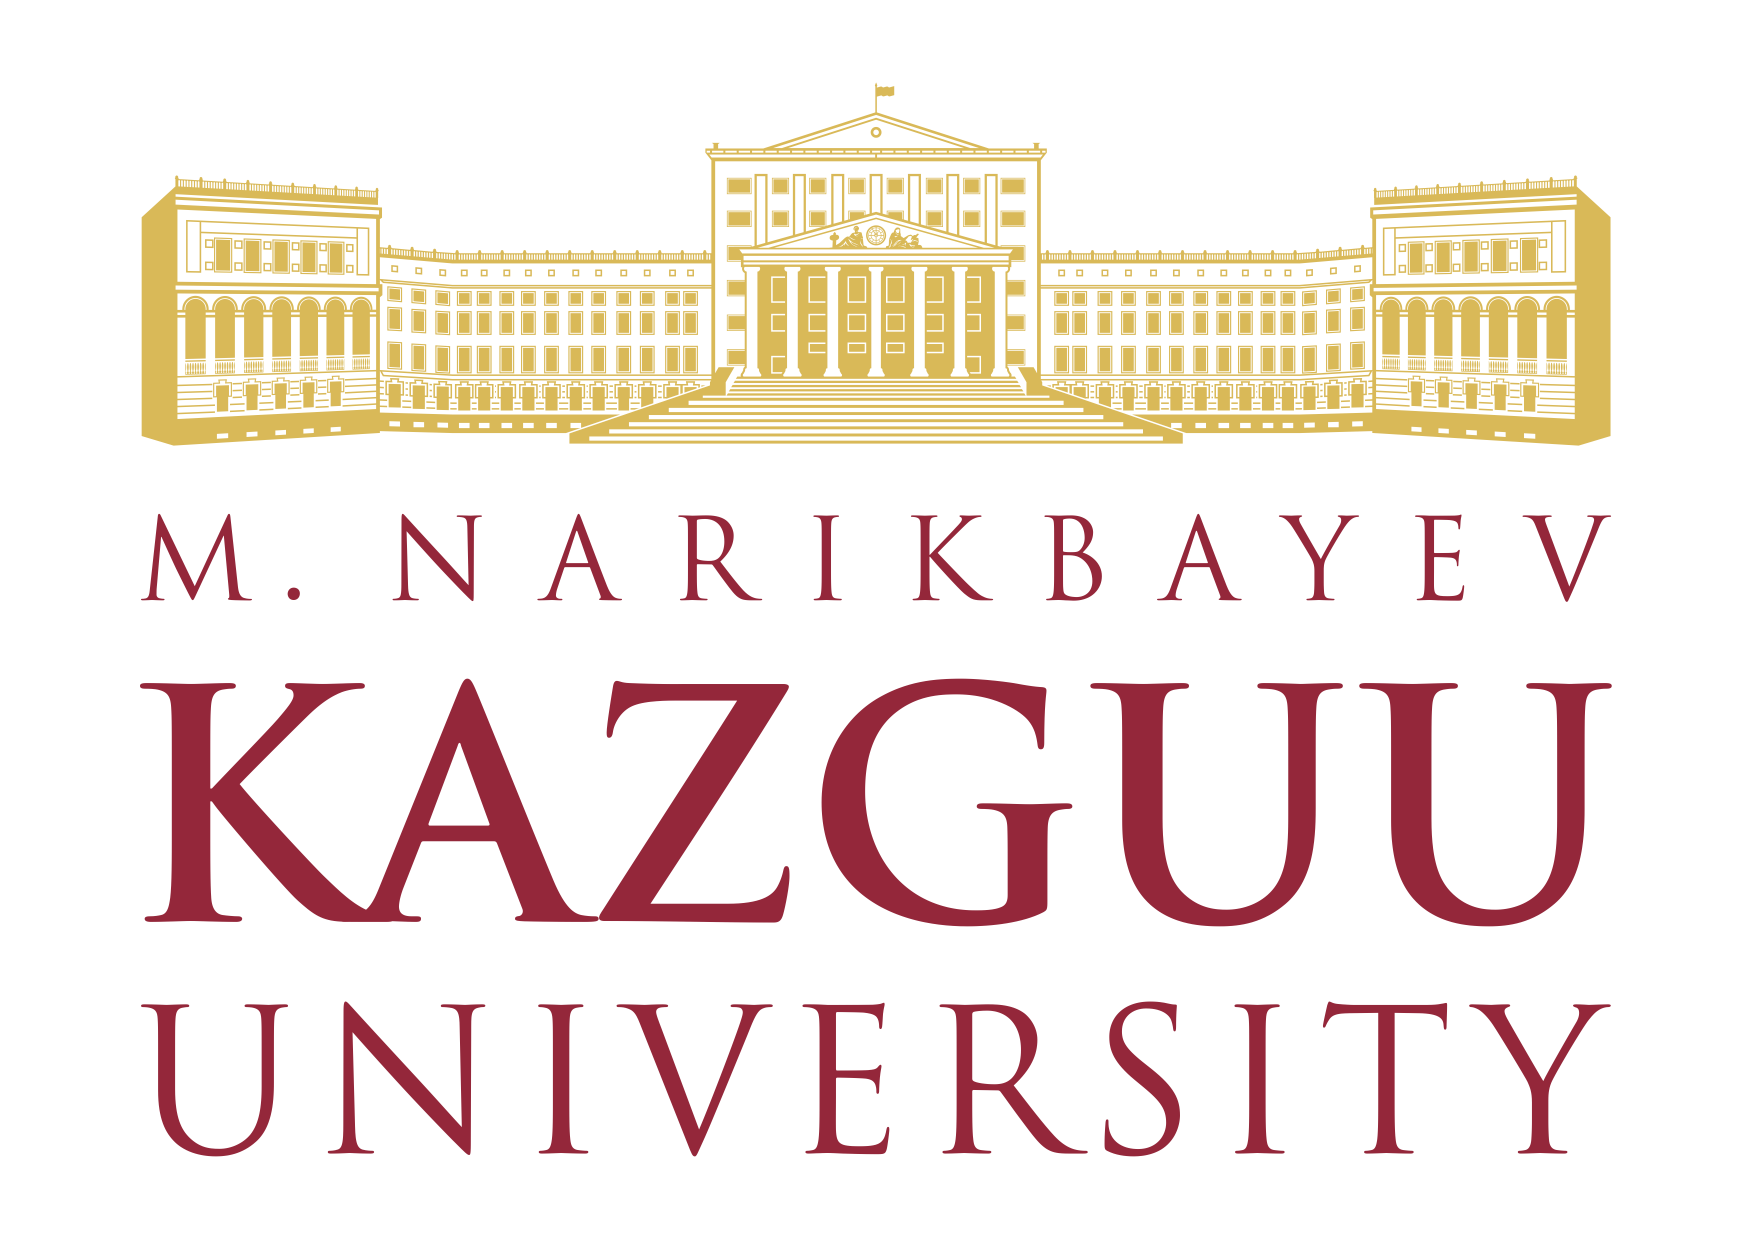 M. NARIKBAYEV KAZGUU UNIVERSITY